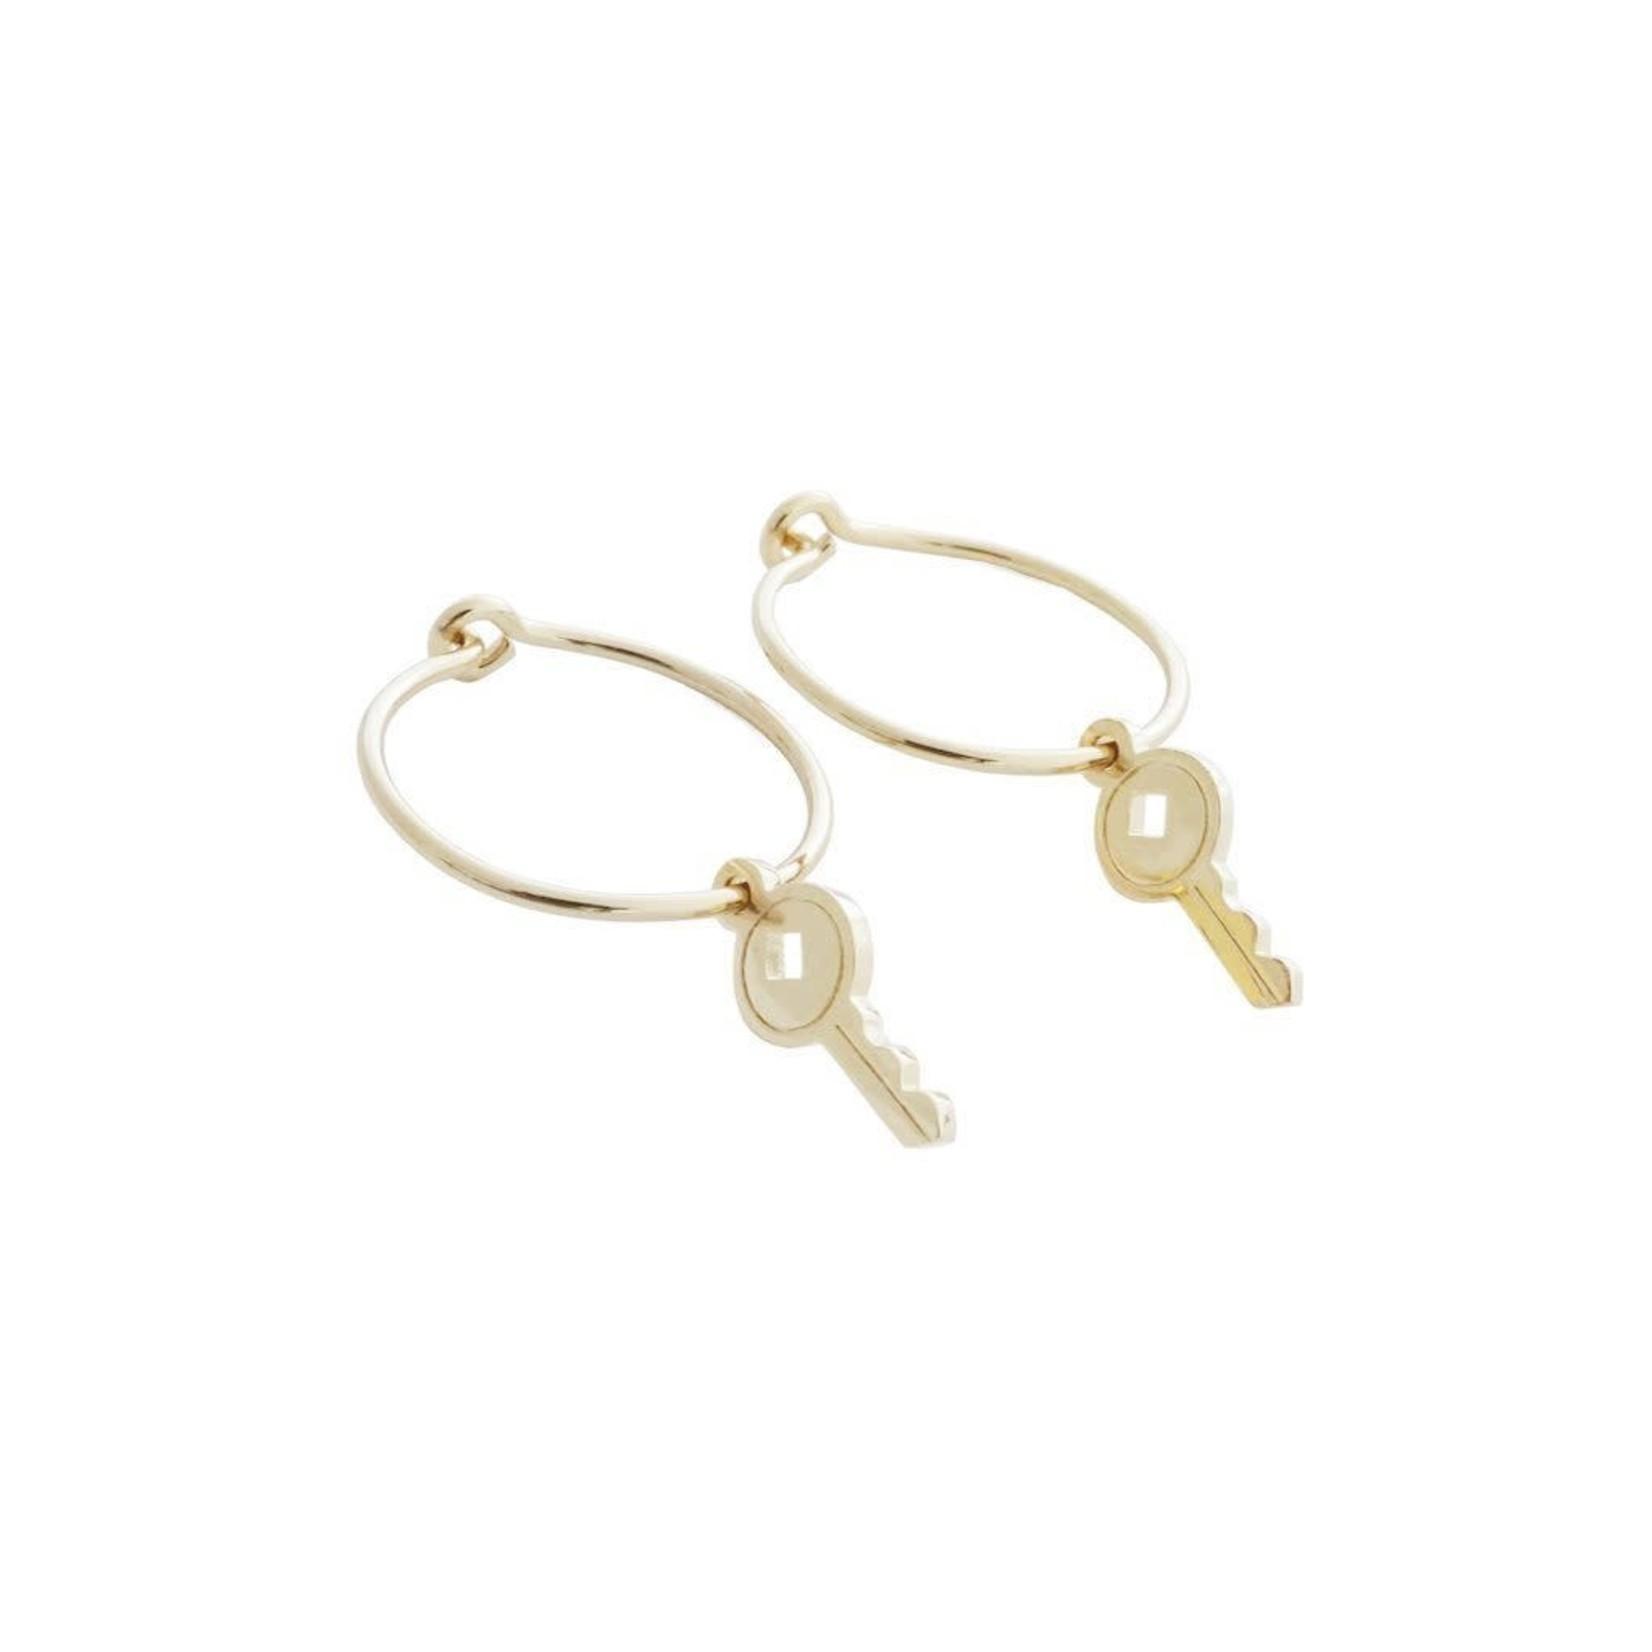 Honeycat Jewelry Honeycat Magic Charm Key Hoops Earrings